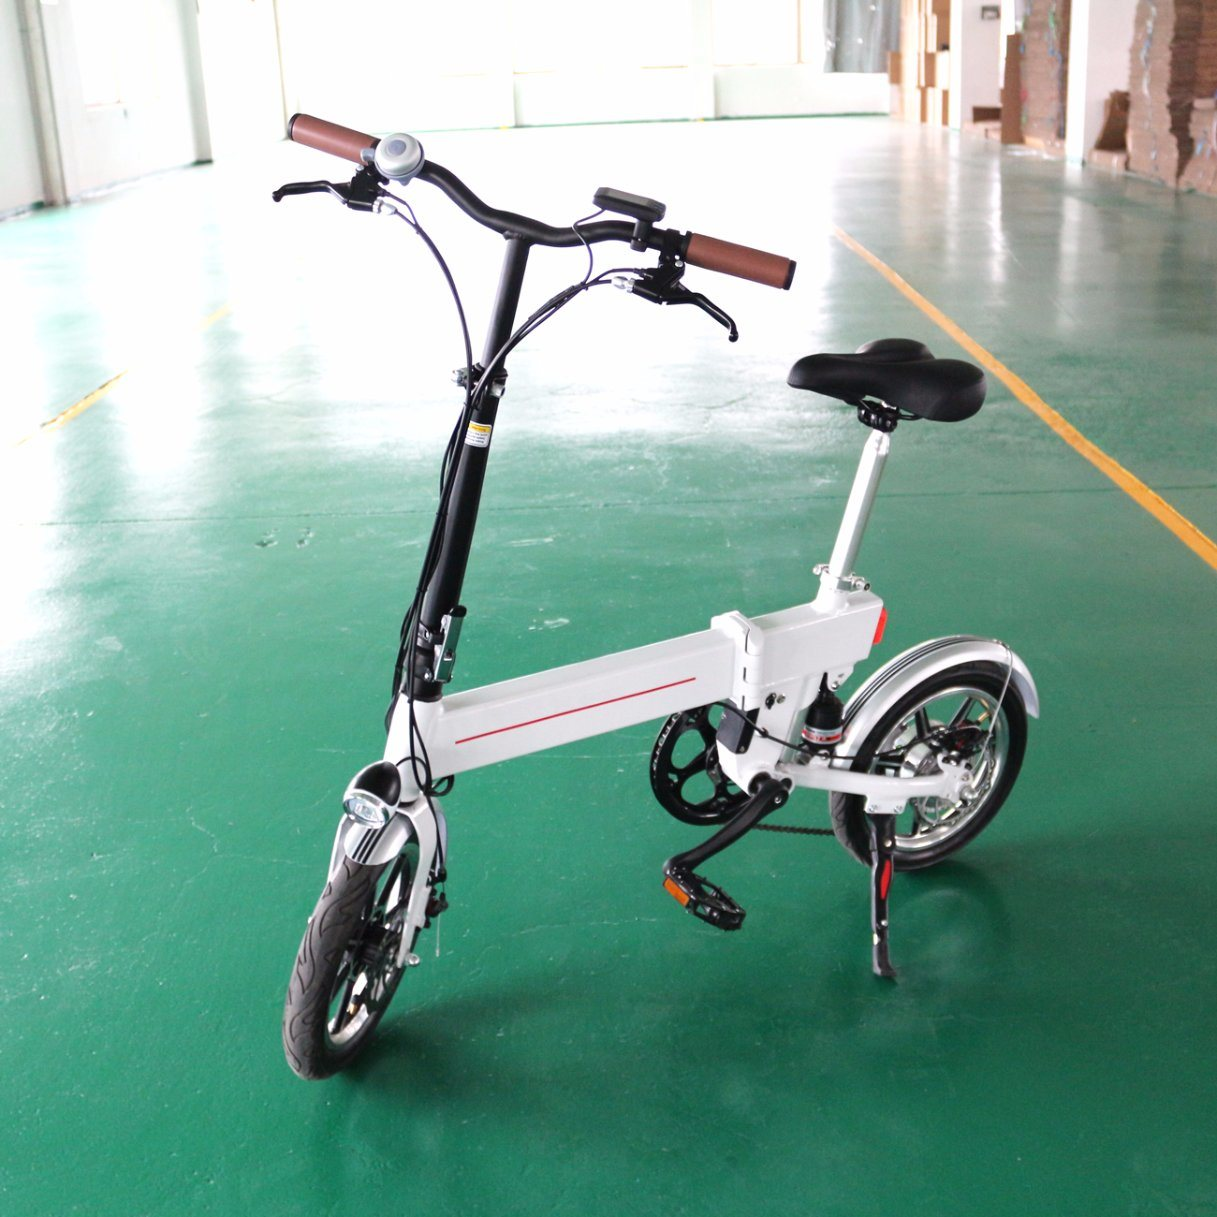 2017 New 36V Lithium Battery Folded Electric Bike 1401